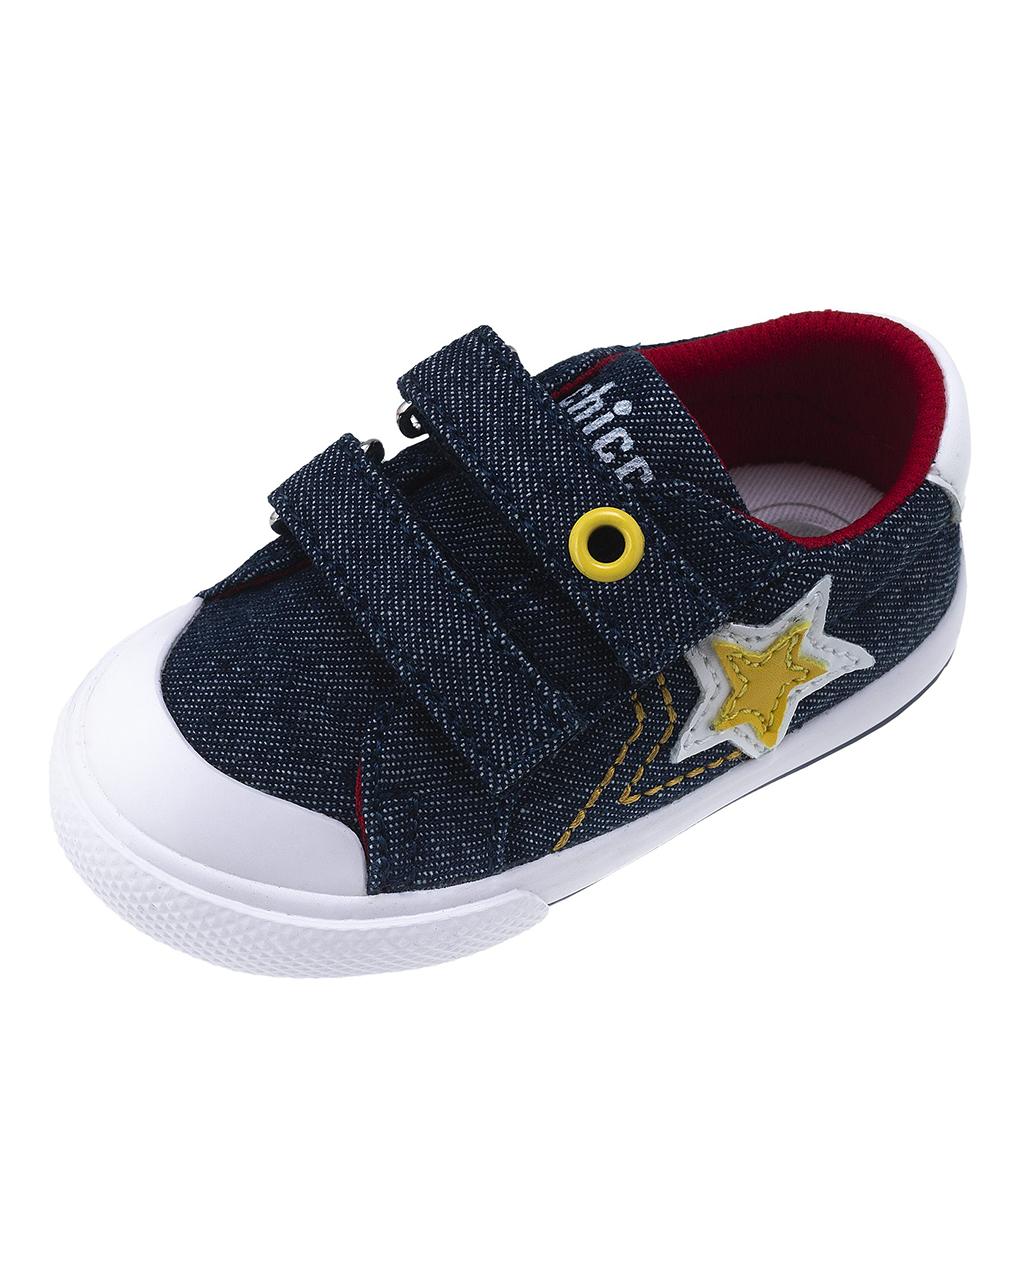 Sneaker maschio gionny - Chicco